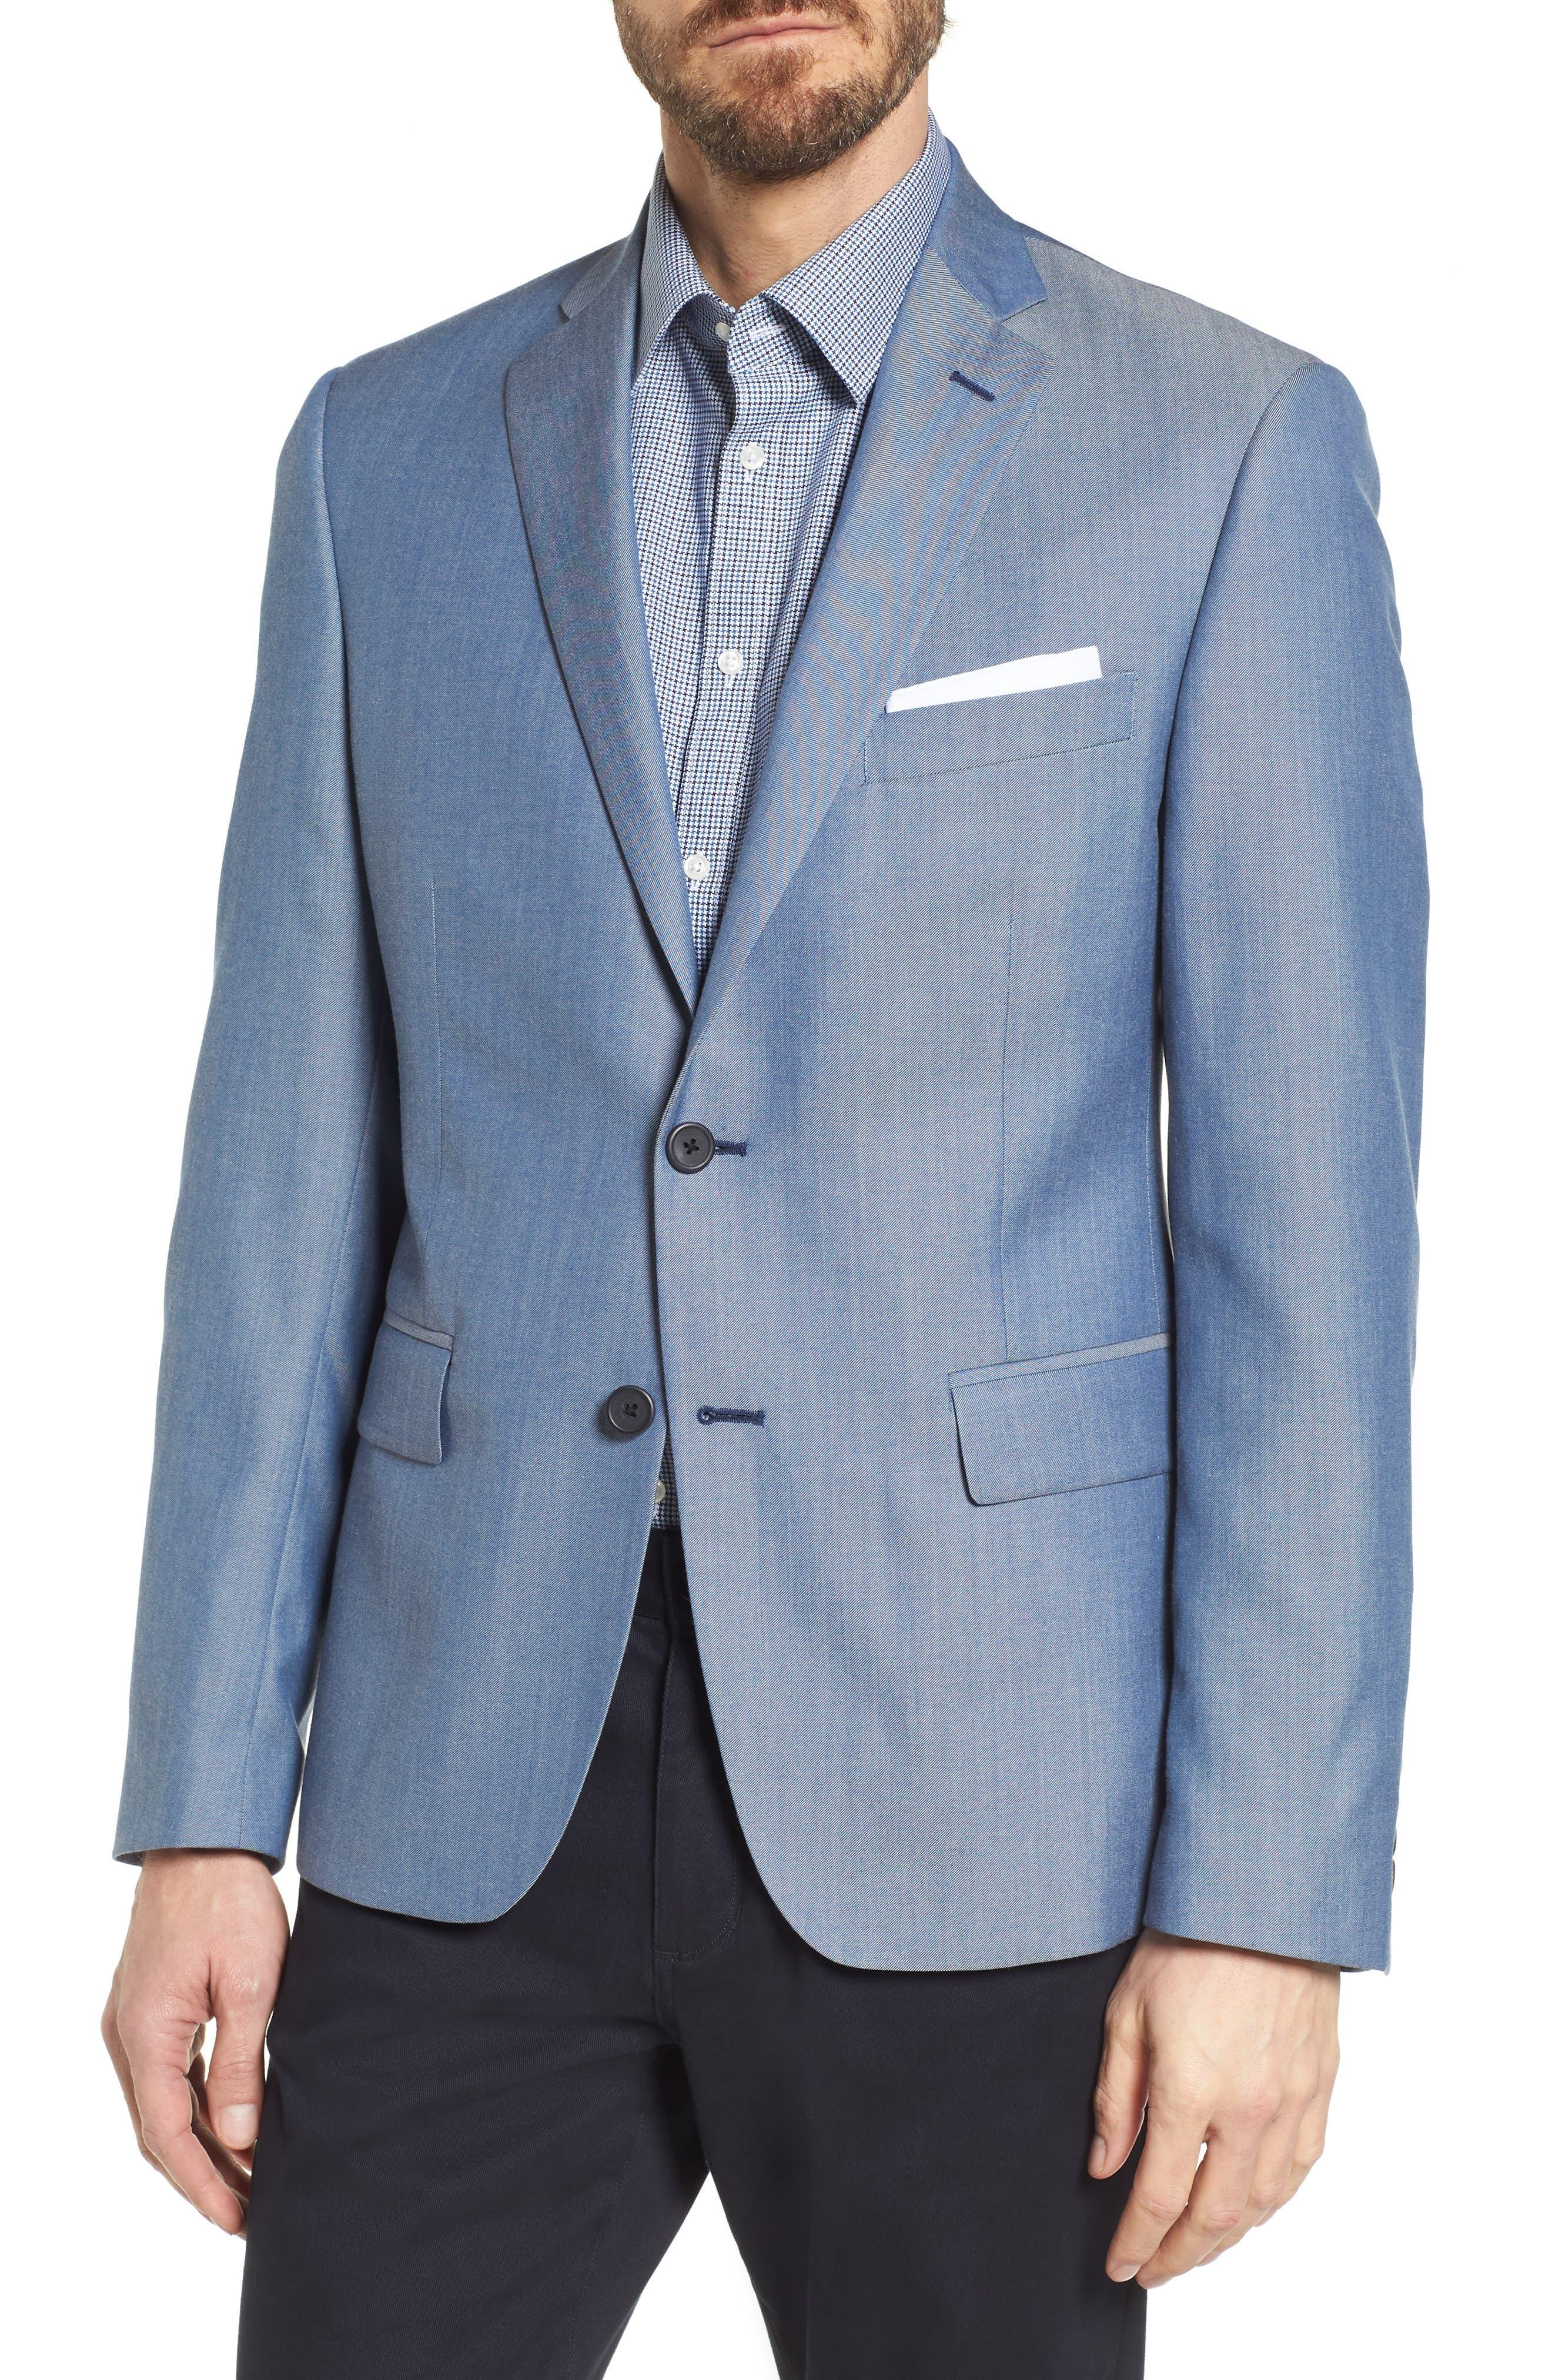 Main Image - Nordstrom Men's Shop Trim Fit Wool & Cotton Blazer